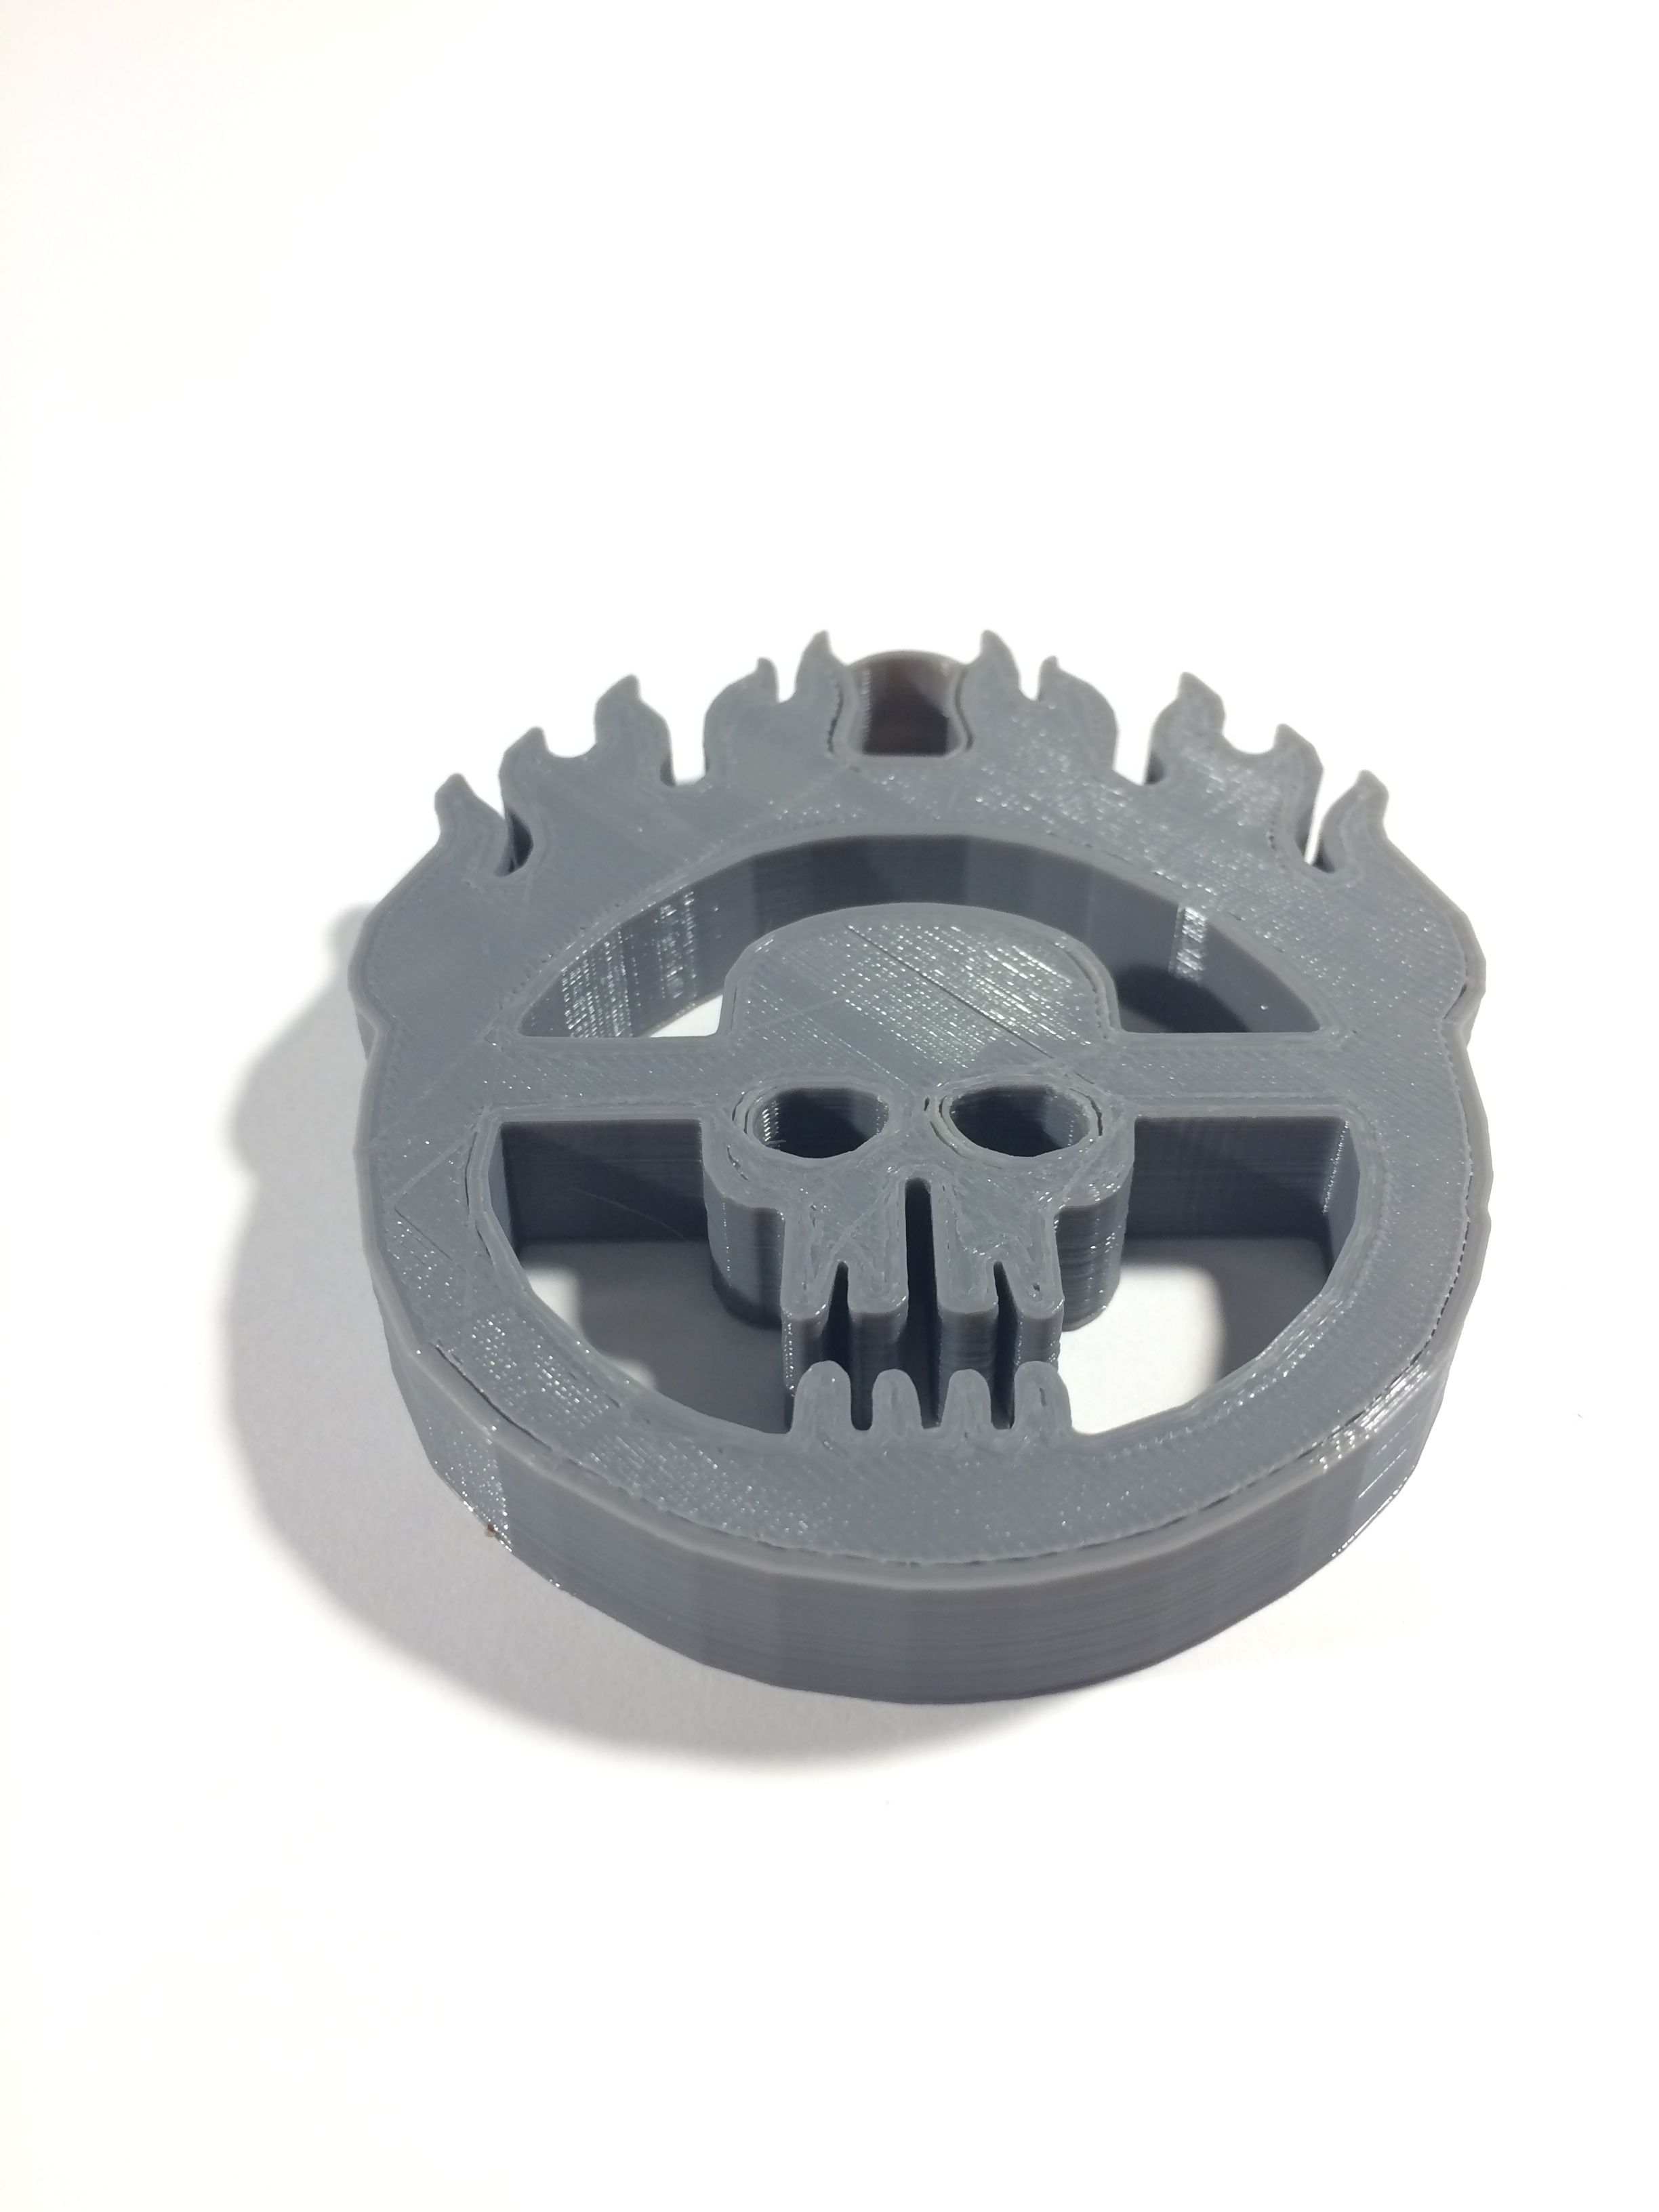 mad max skull image